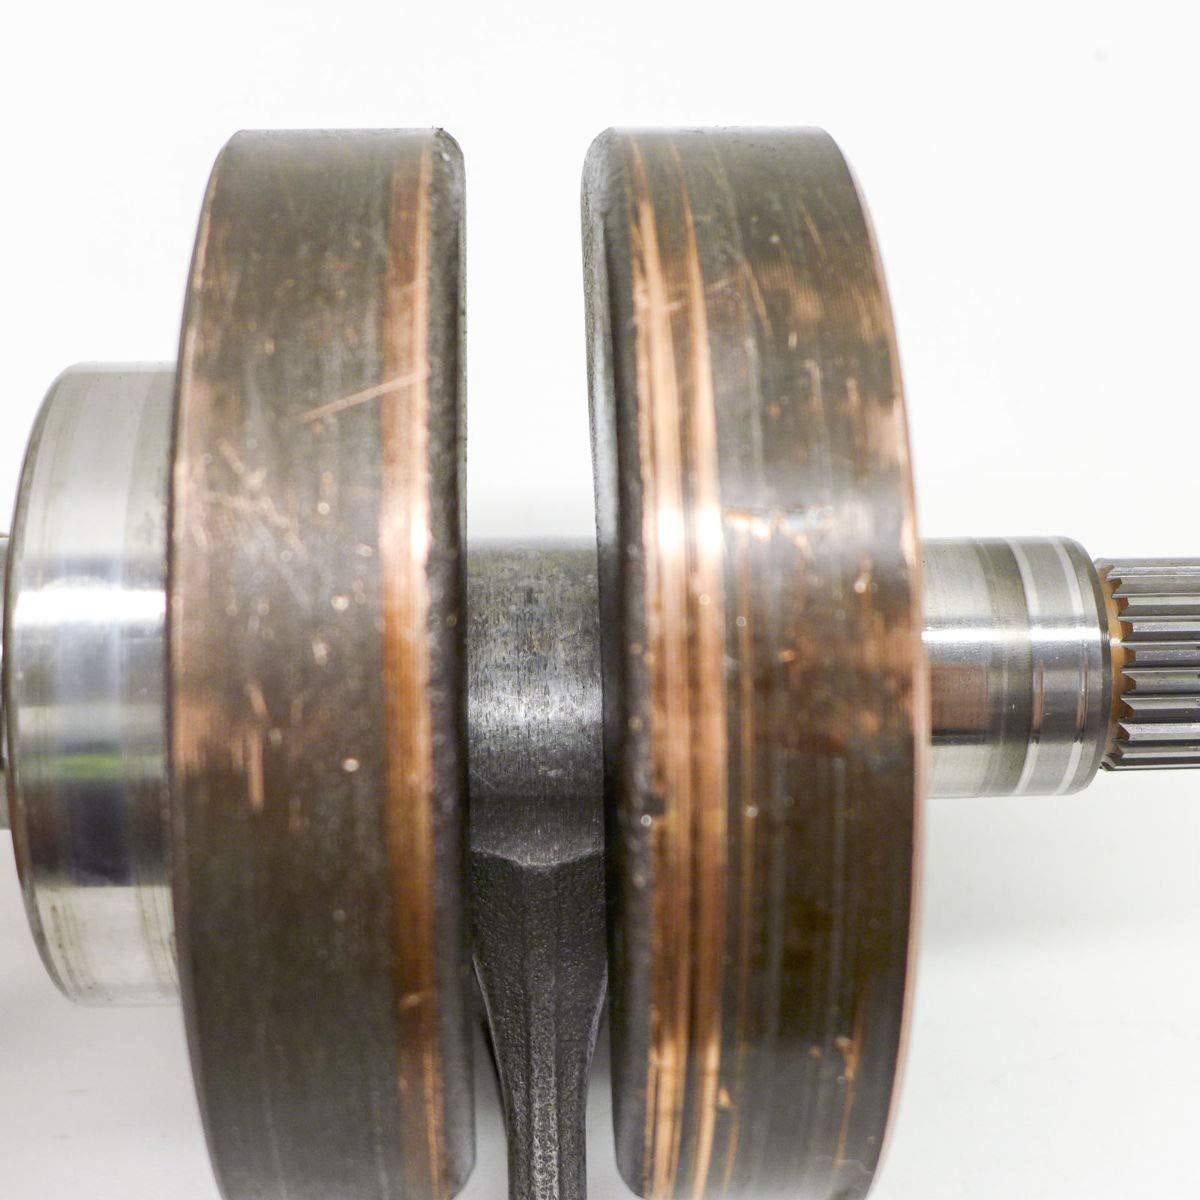 Honda 2004-2008 Trx Crankshaft Set 13090-Hp1-315 New Oem